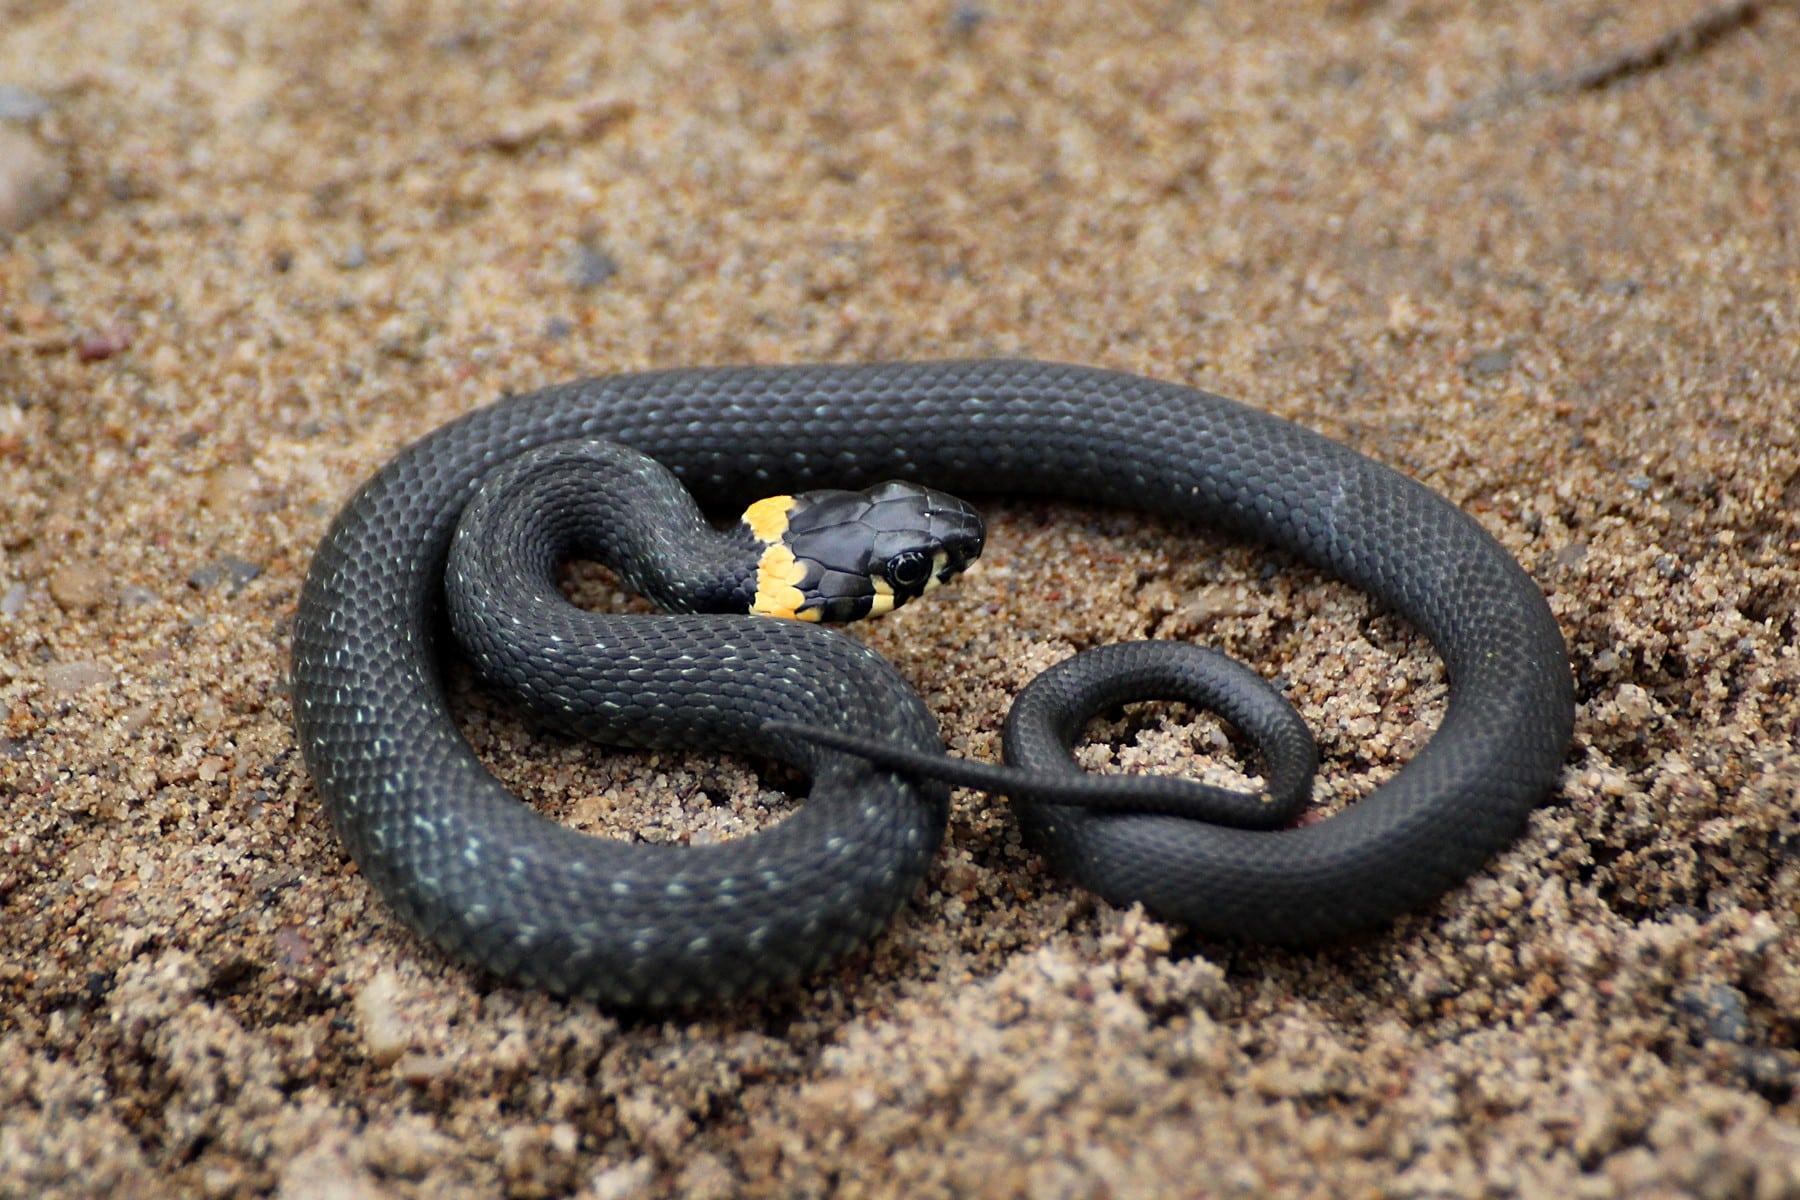 змеи в татарстане в картинках него